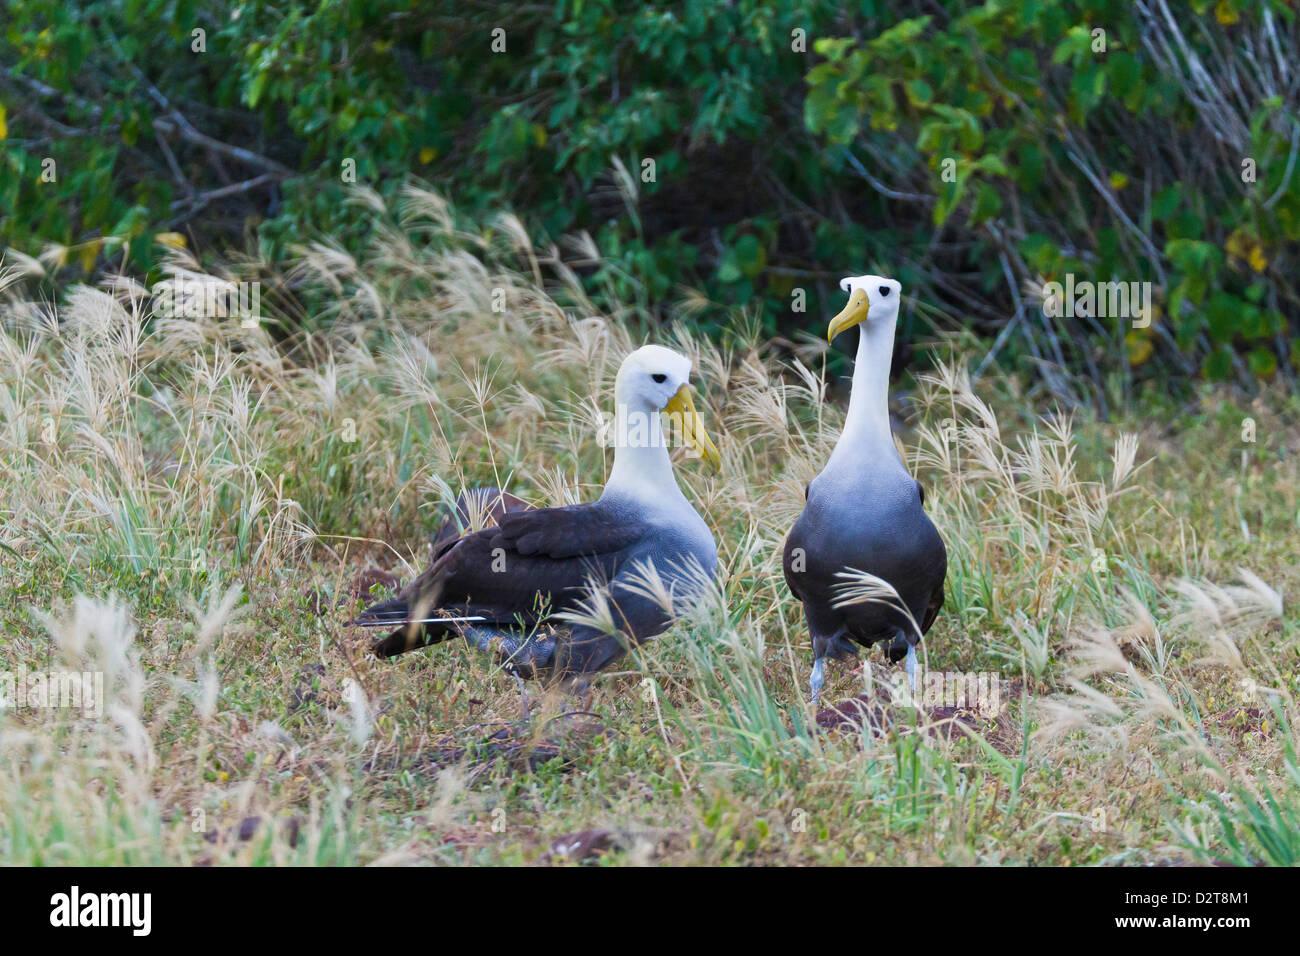 Waved albatross (Diomedea irrorata) courtship display, Espanola Island, Galapagos Islands, Ecuador Stock Photo